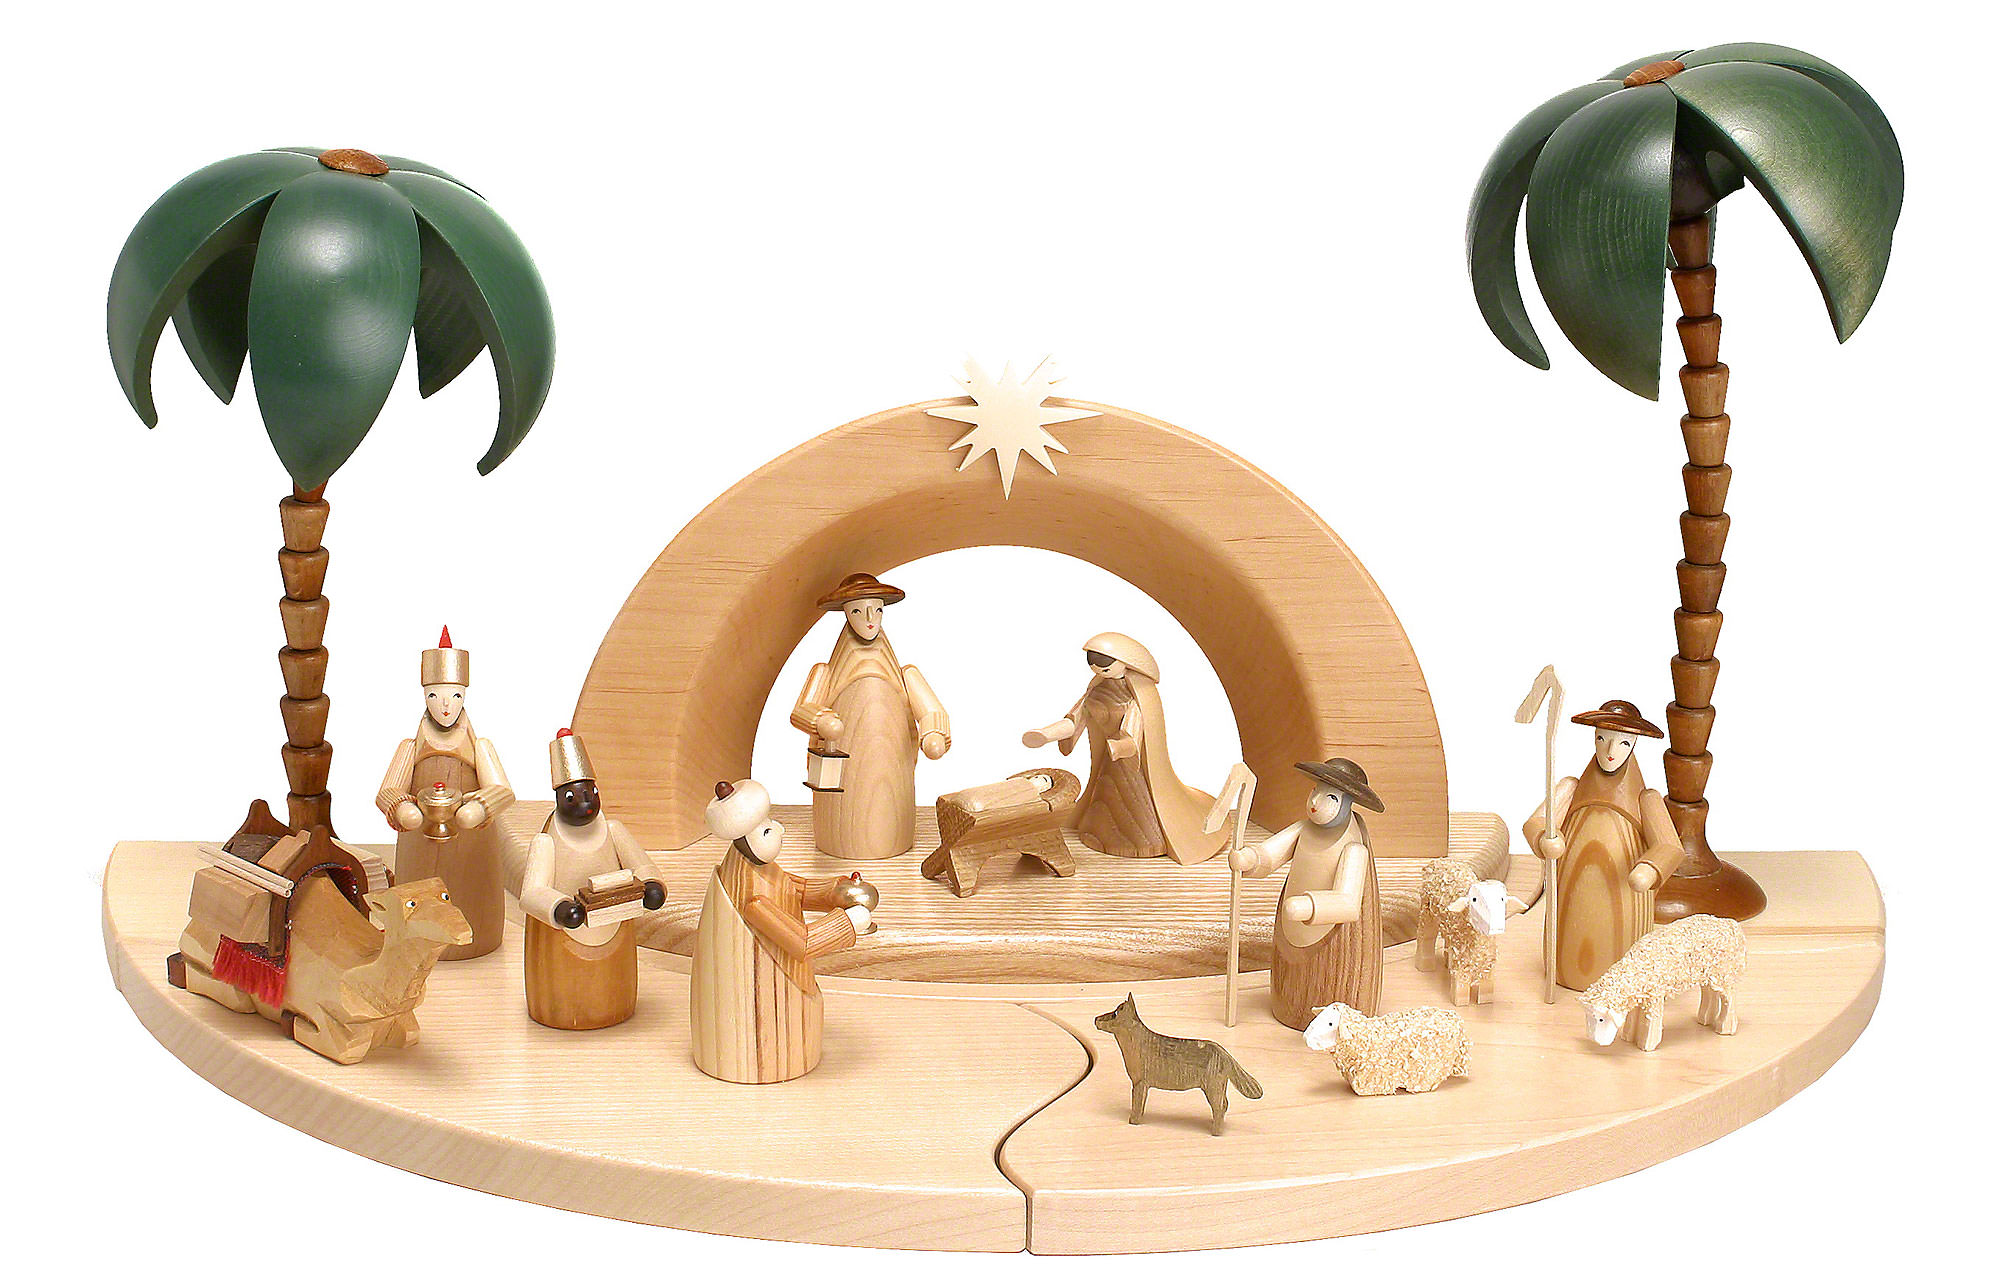 Weihnachtskrippe Modern.Modern Nativity Set Religious Christmas Decoration Homesfeed